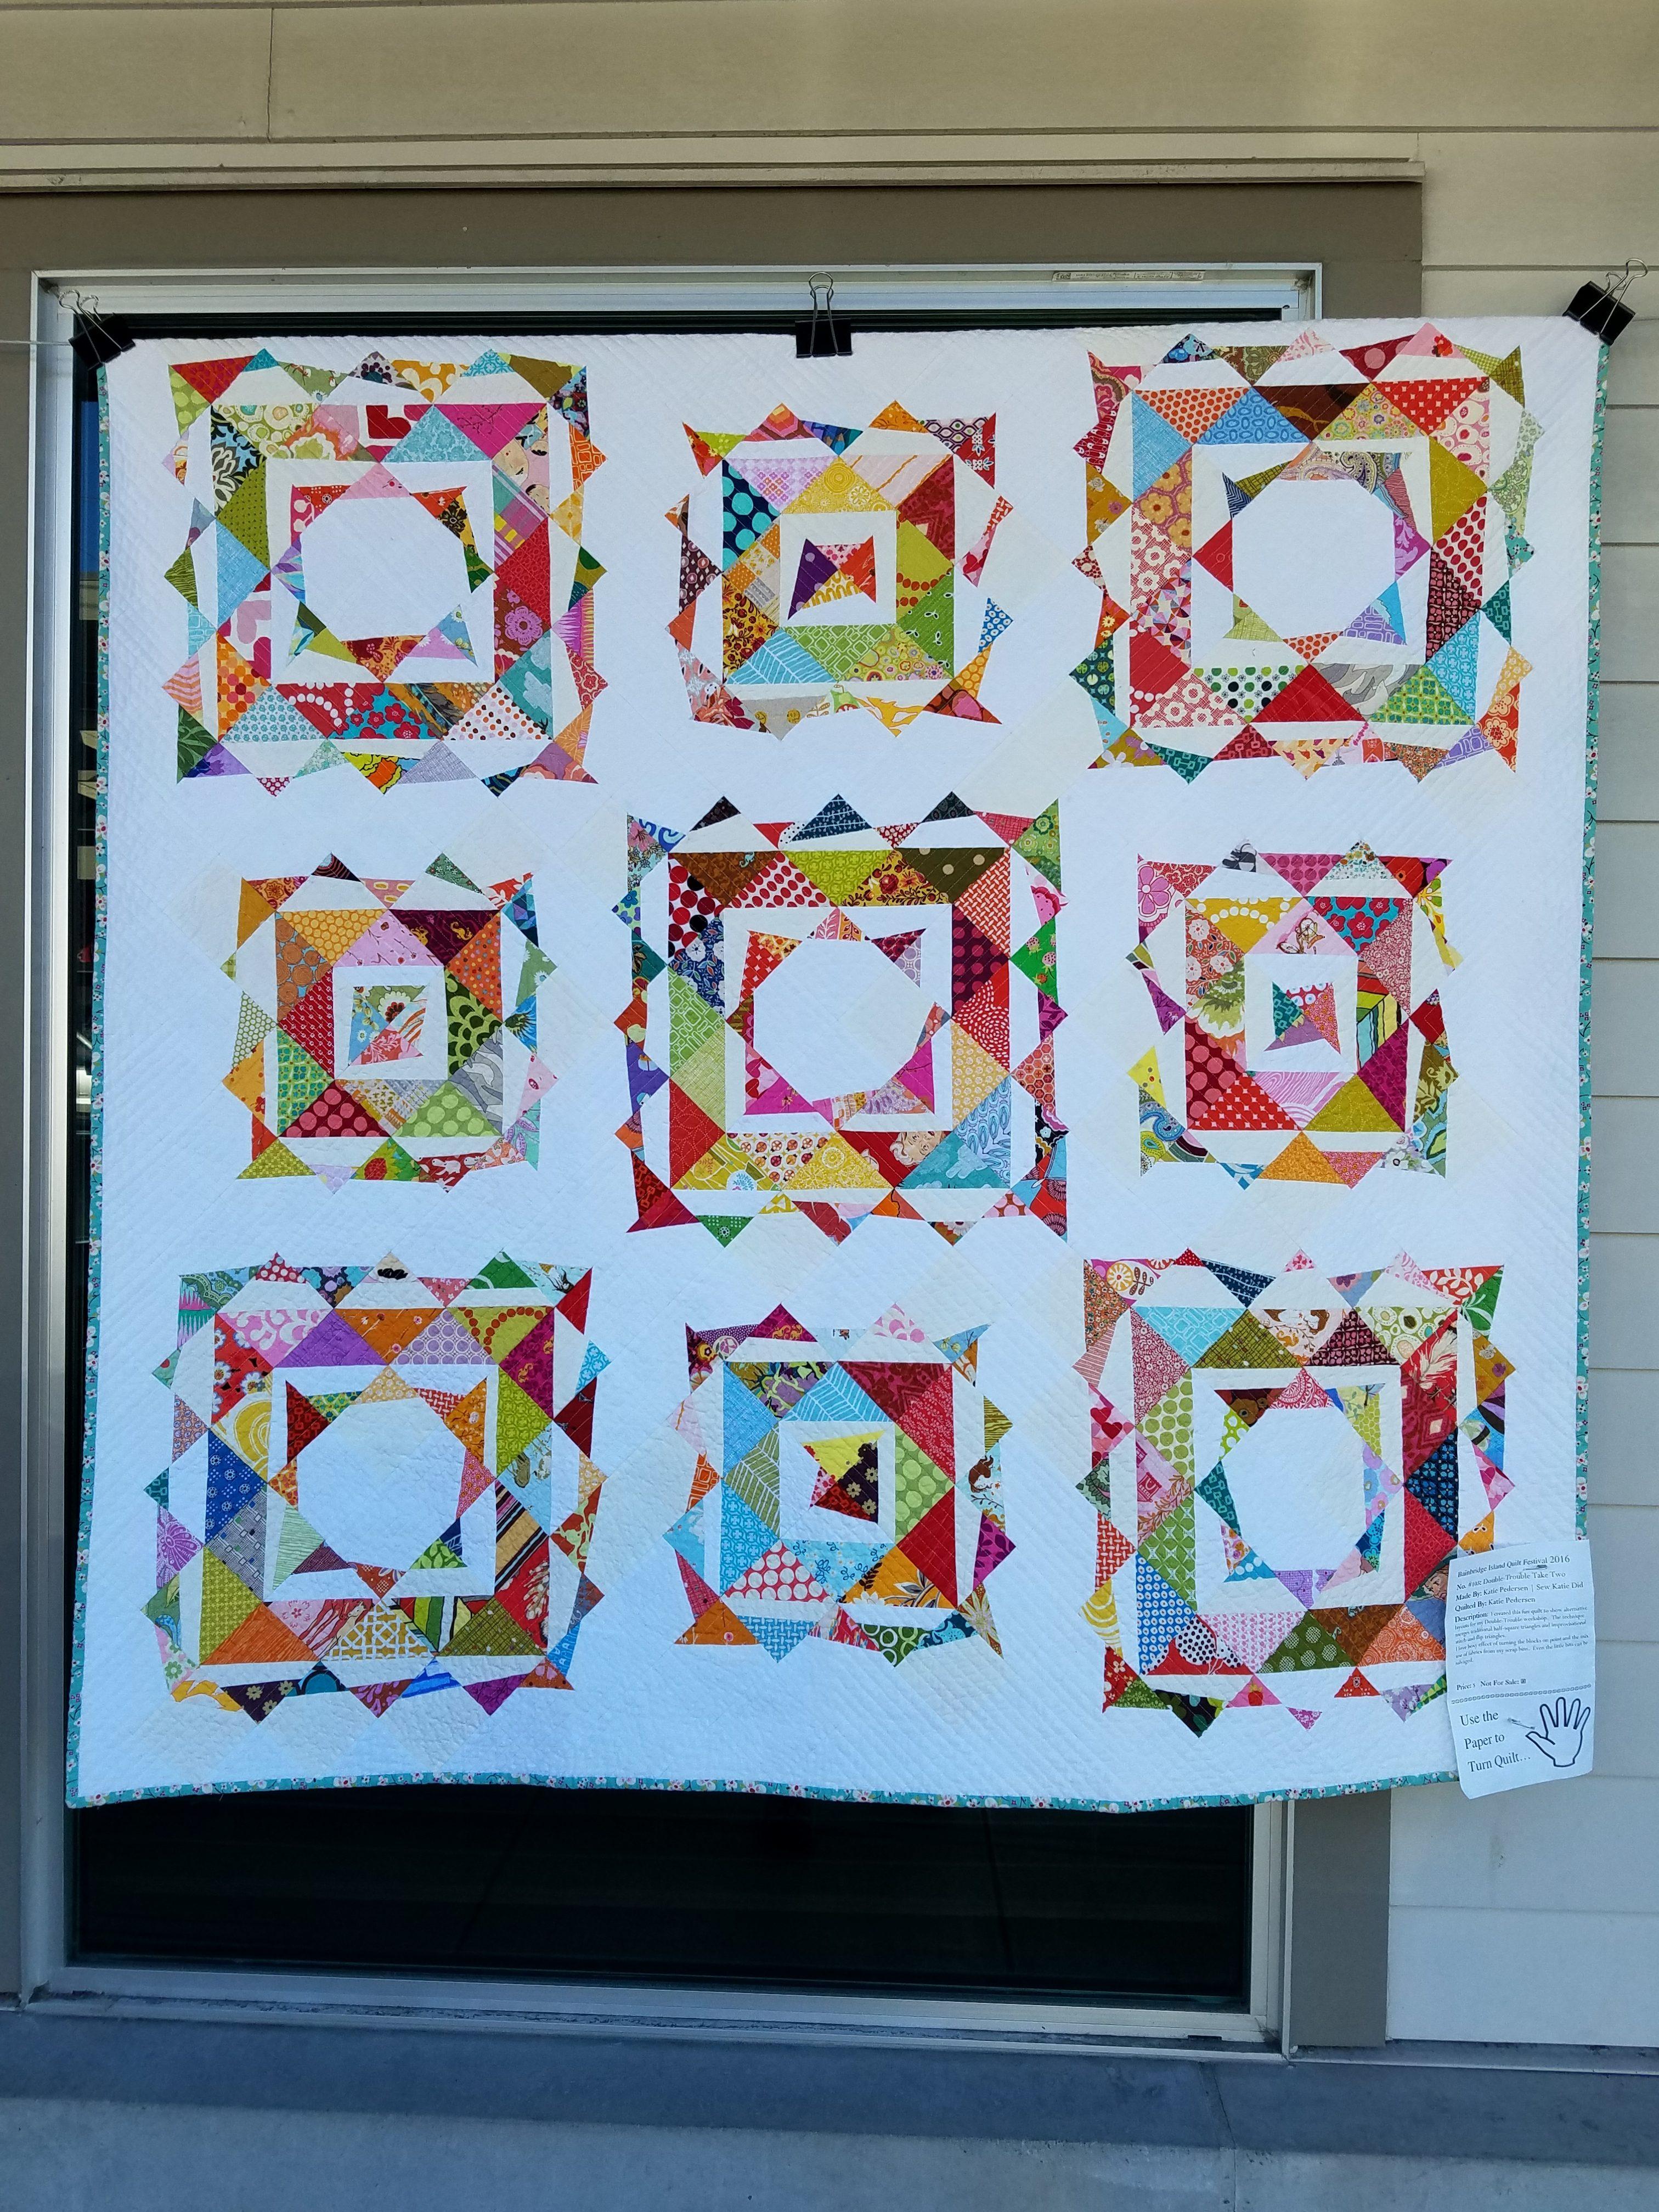 Modern quilt   Dragonfly Quilts Blog : taking turns quilt - Adamdwight.com